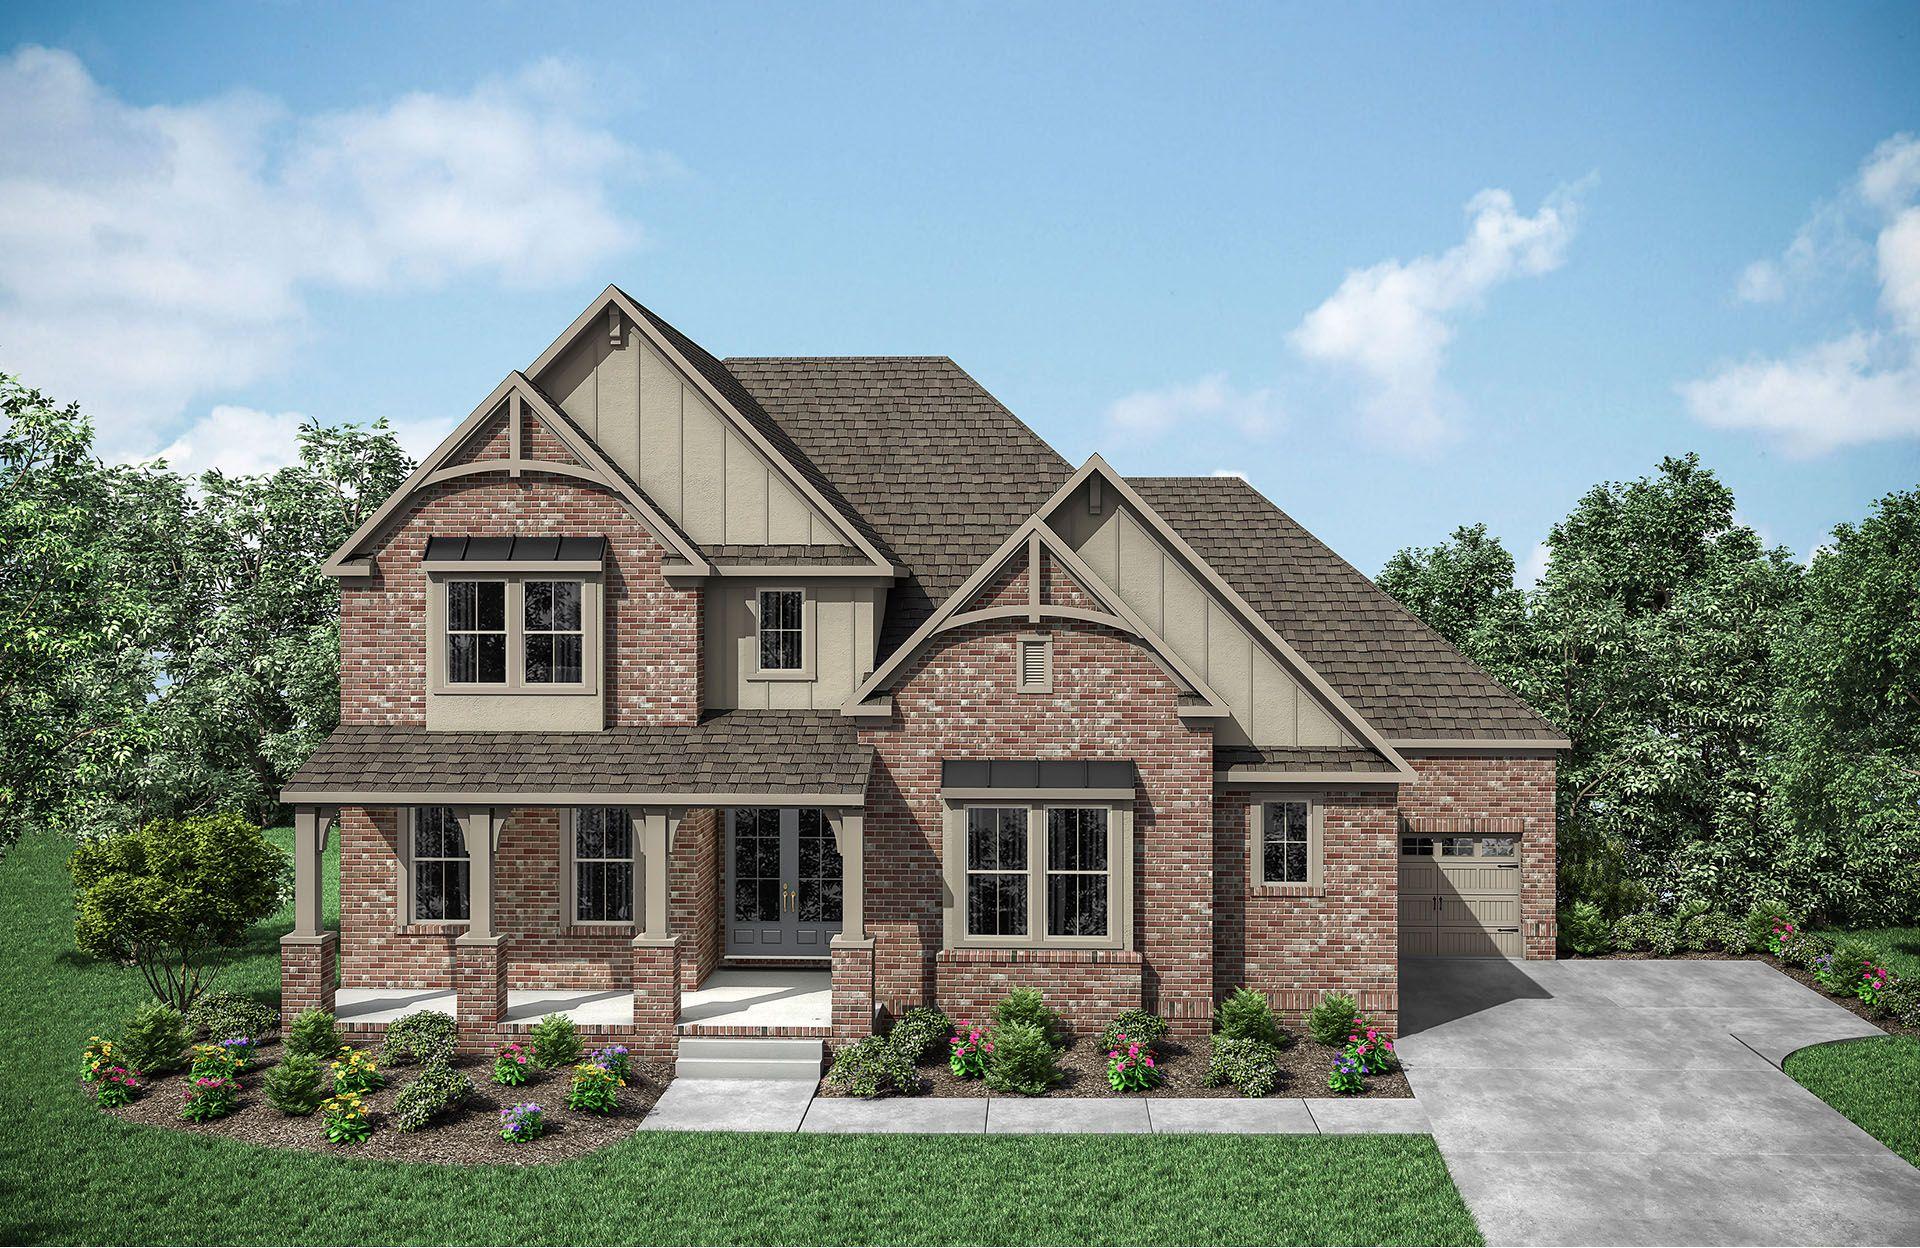 Single Family for Sale at Somerville 9481 Whetstone Blvd Nashville, Tennessee 37214 United States